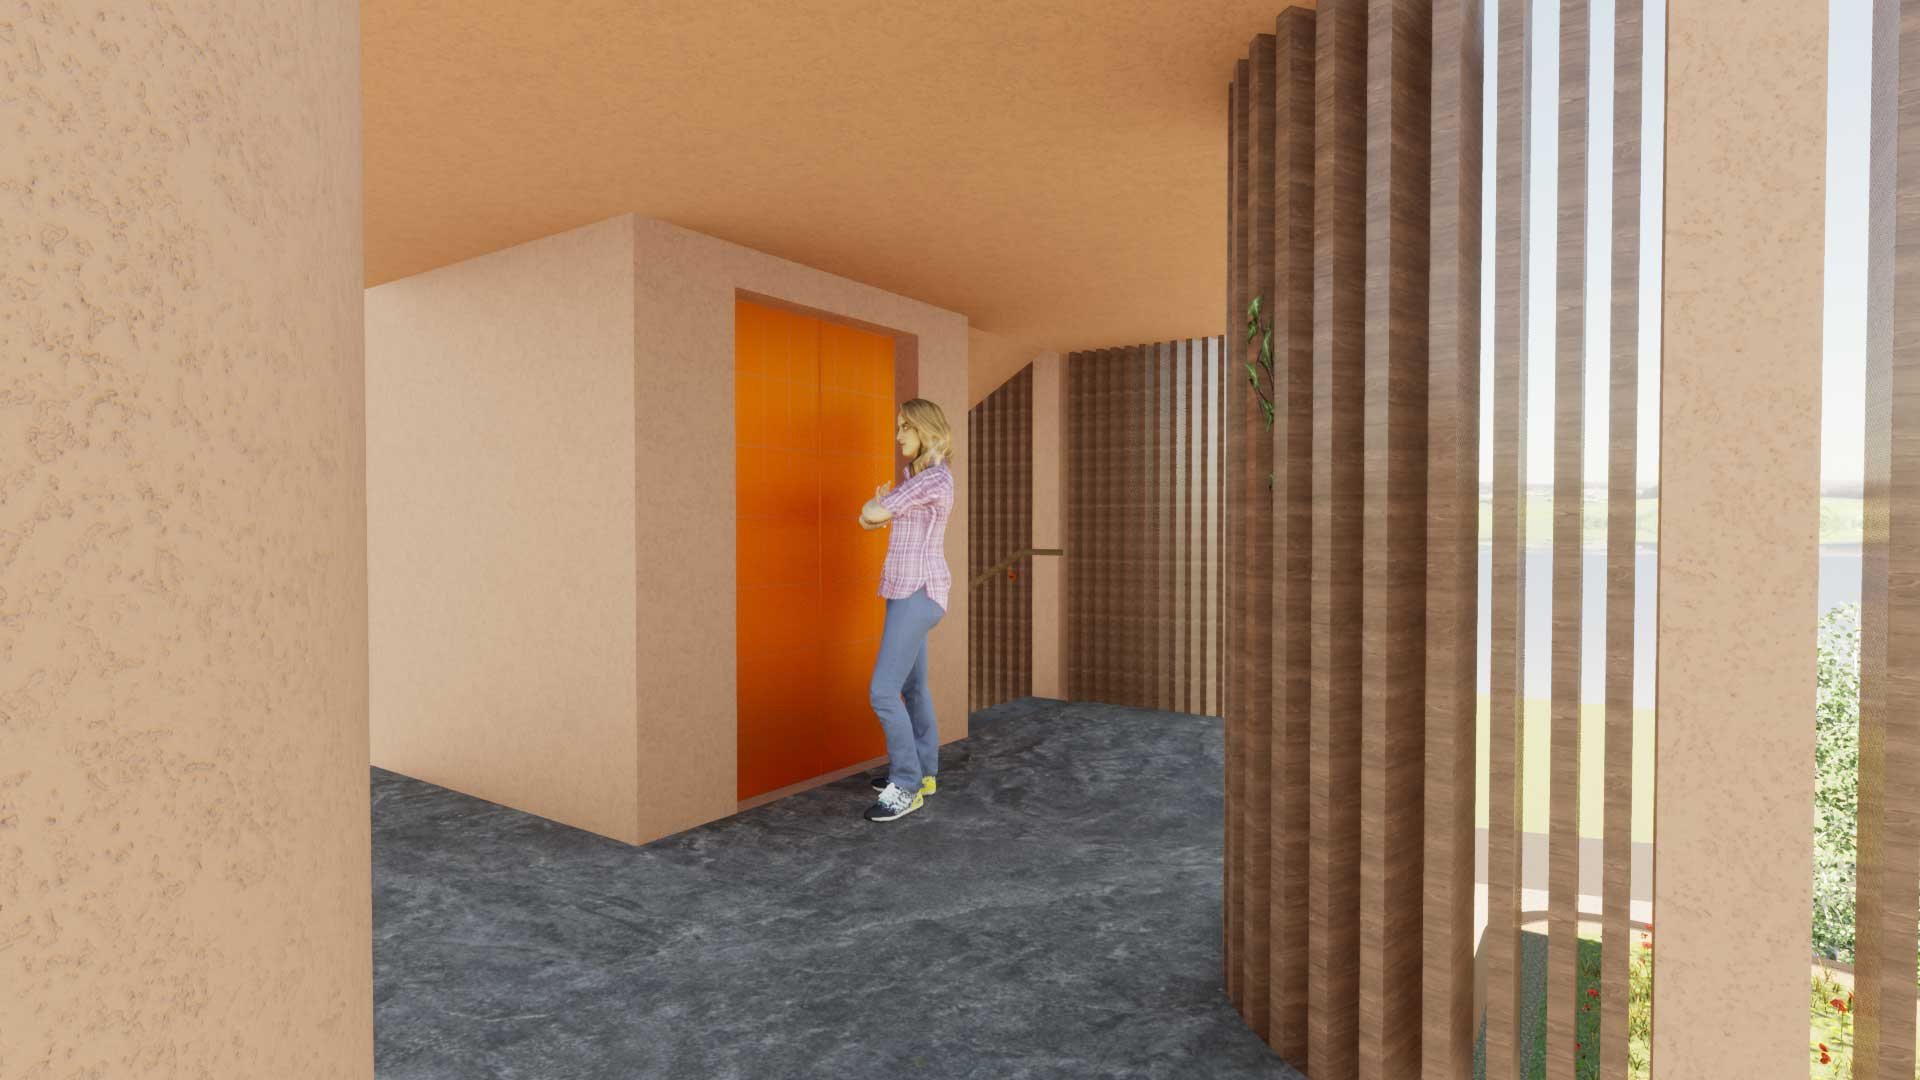 Treppenhaus mit Lift